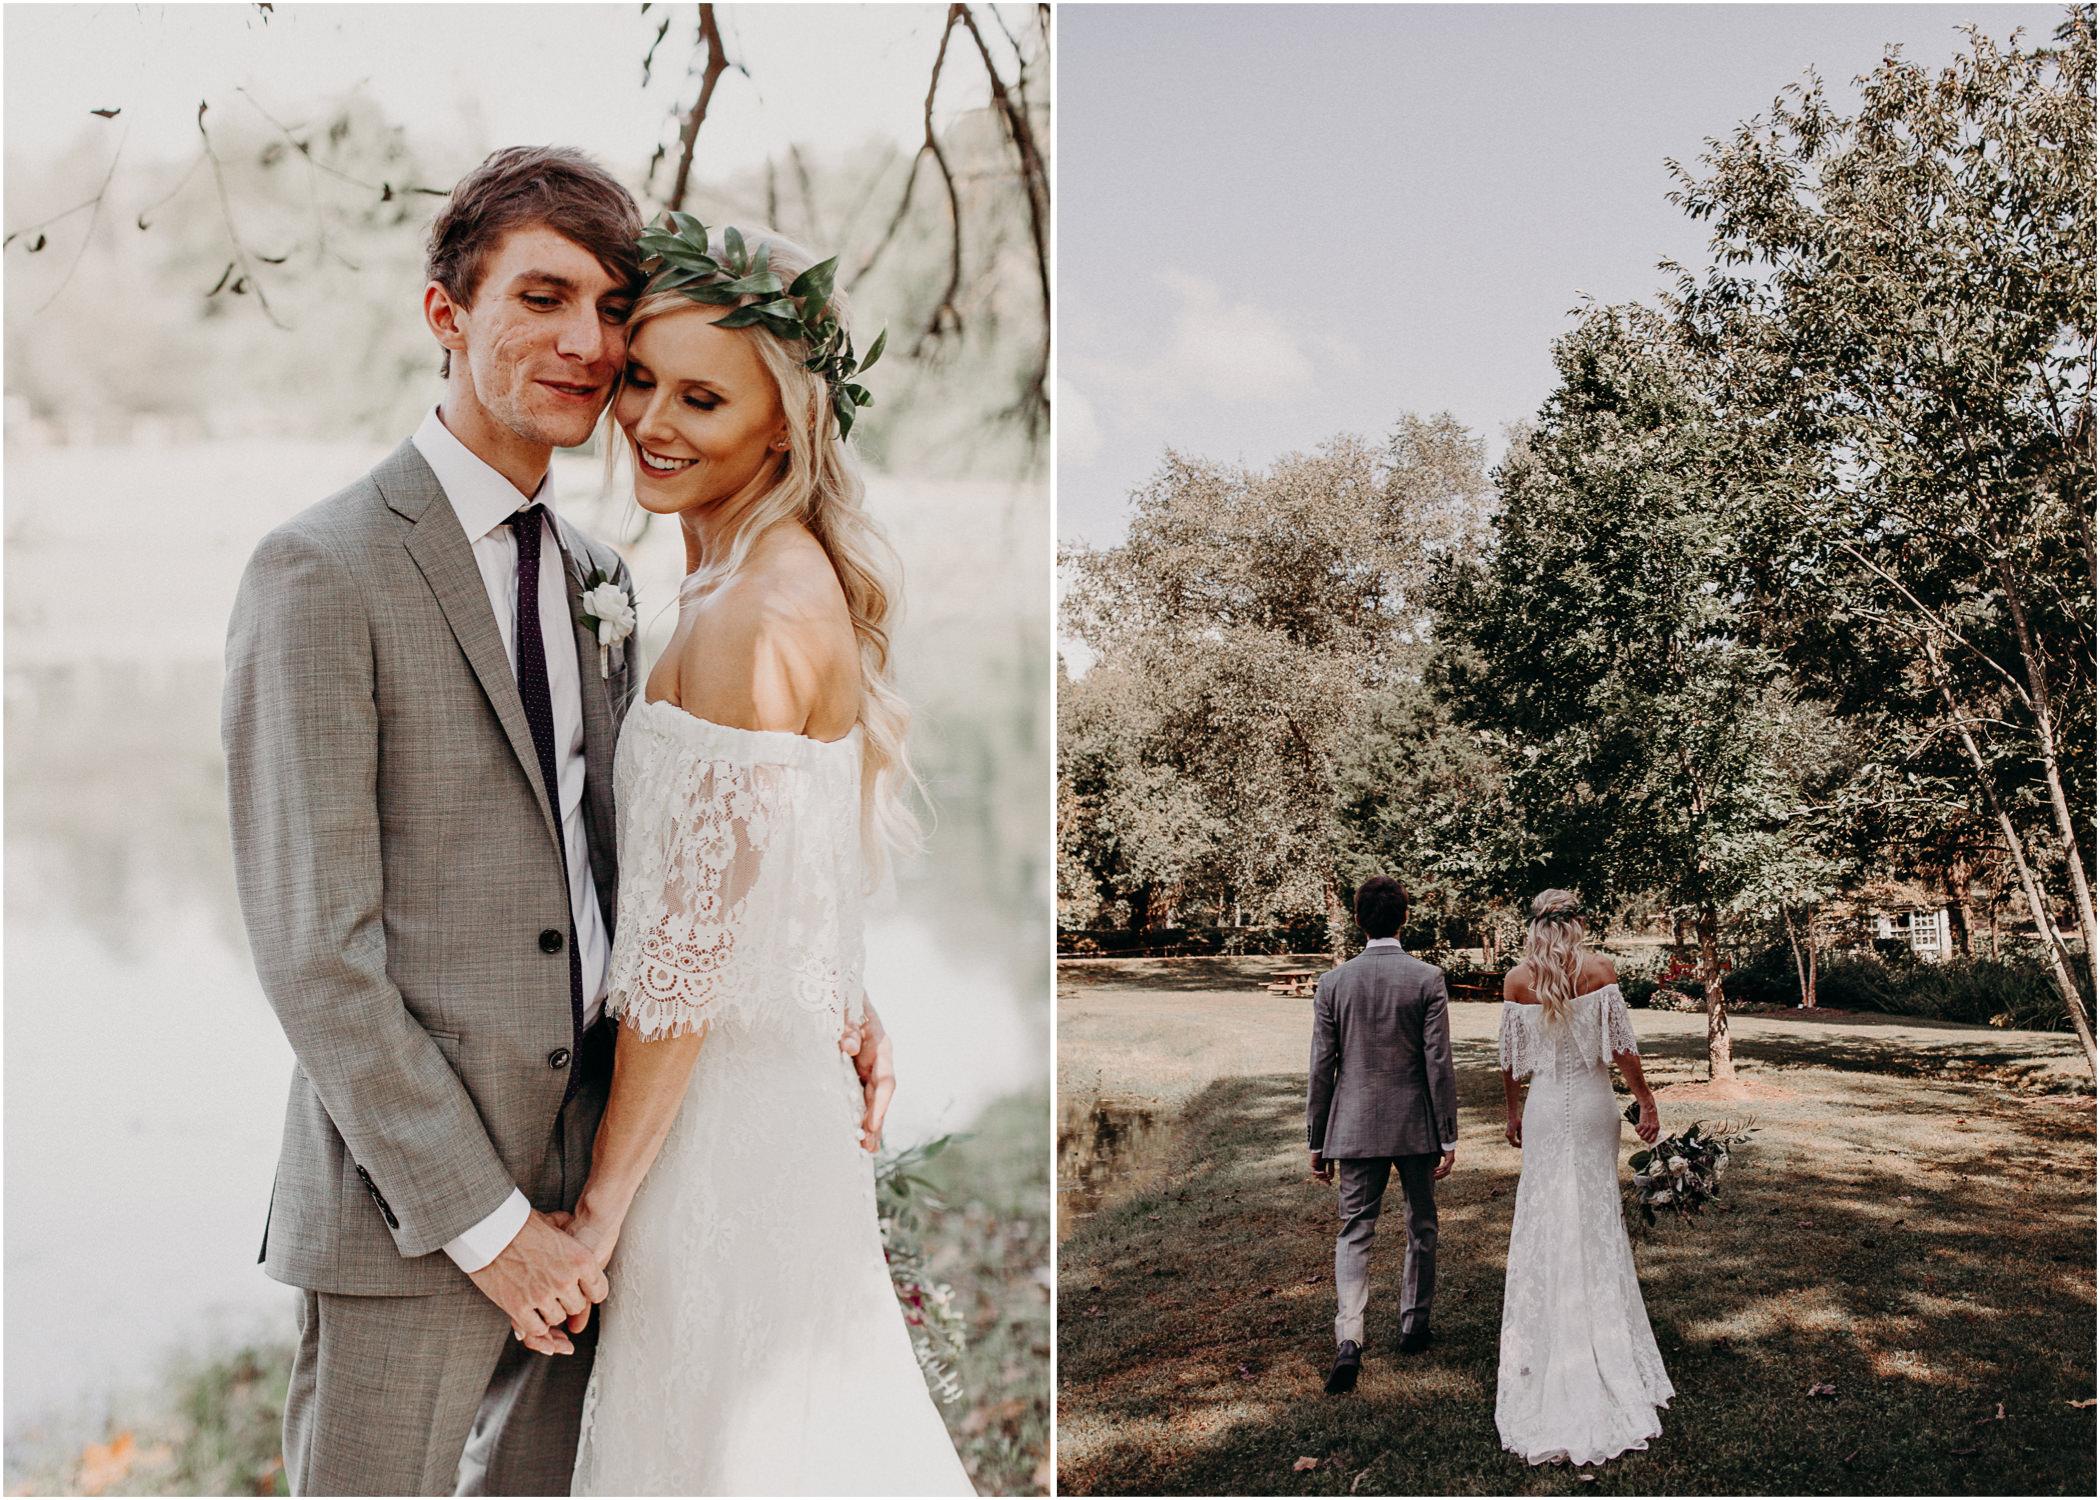 88 - Barnsley Gardens Wedding -Bride and groom portraits - Atlanta wedding photographer .jpg